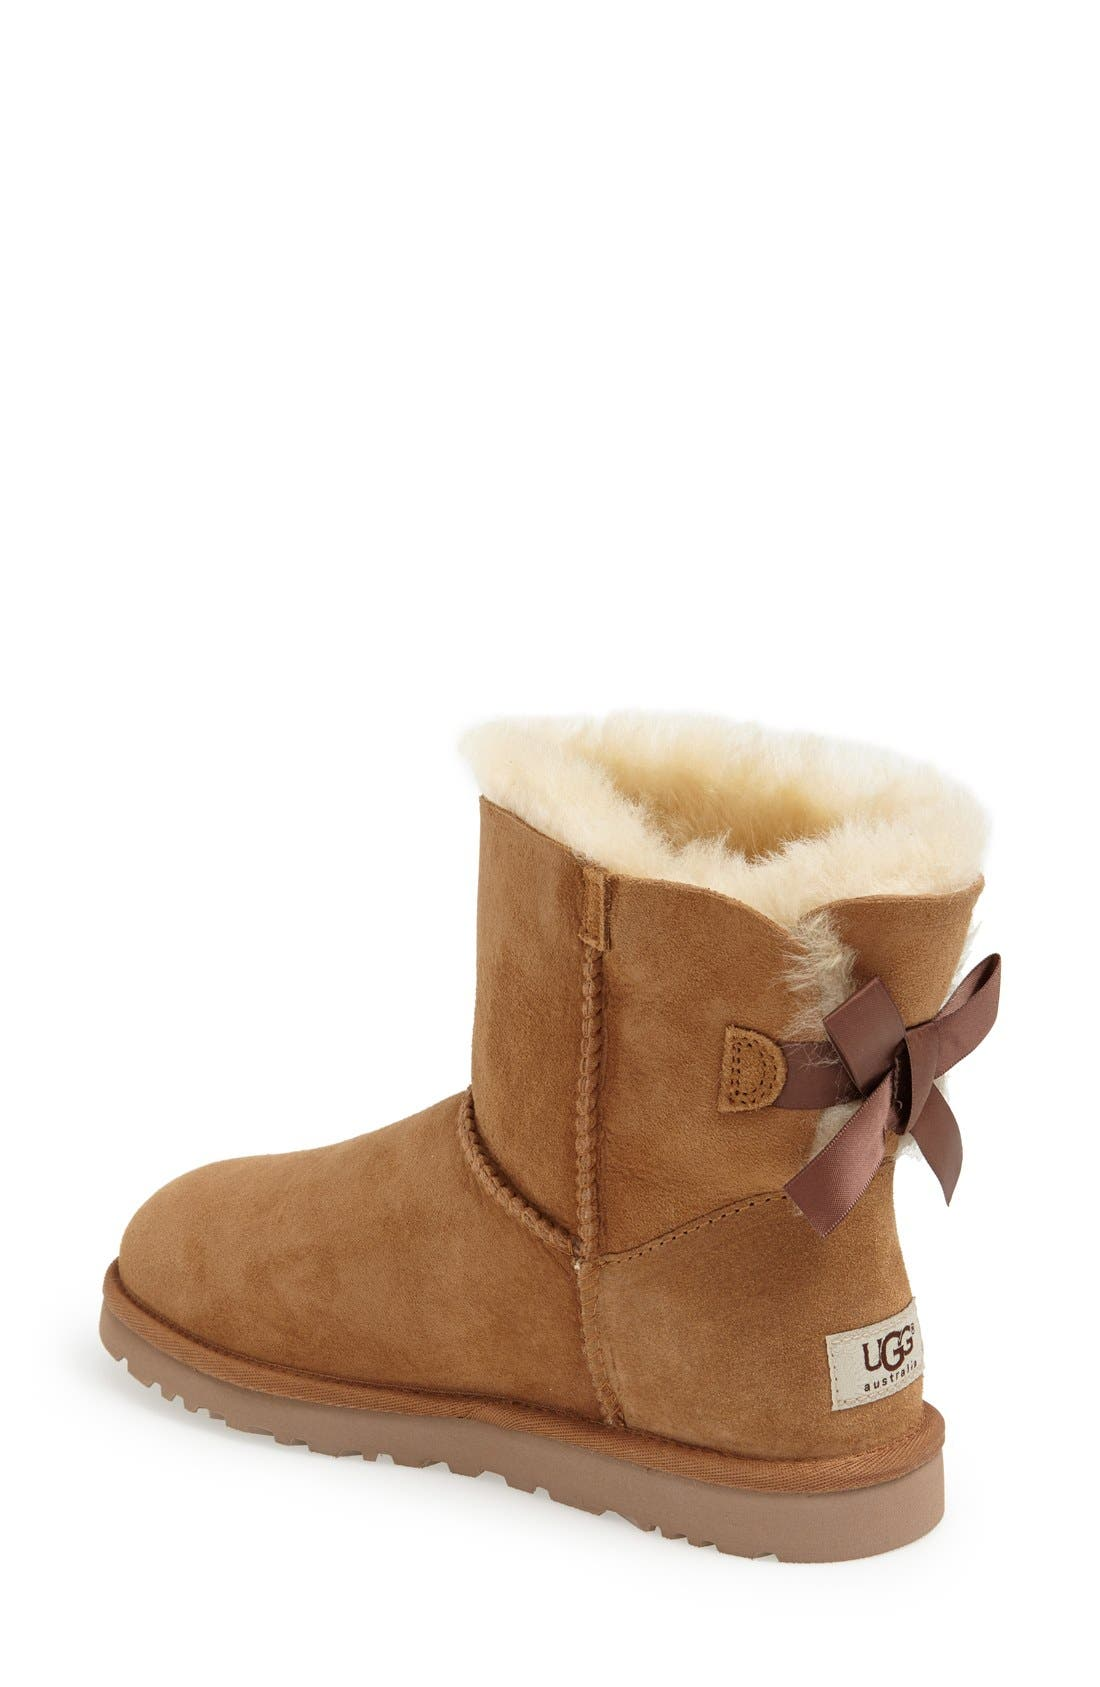 Alternate Image 2  - UGG® 'Mini Bailey Bow' Boot (Women)